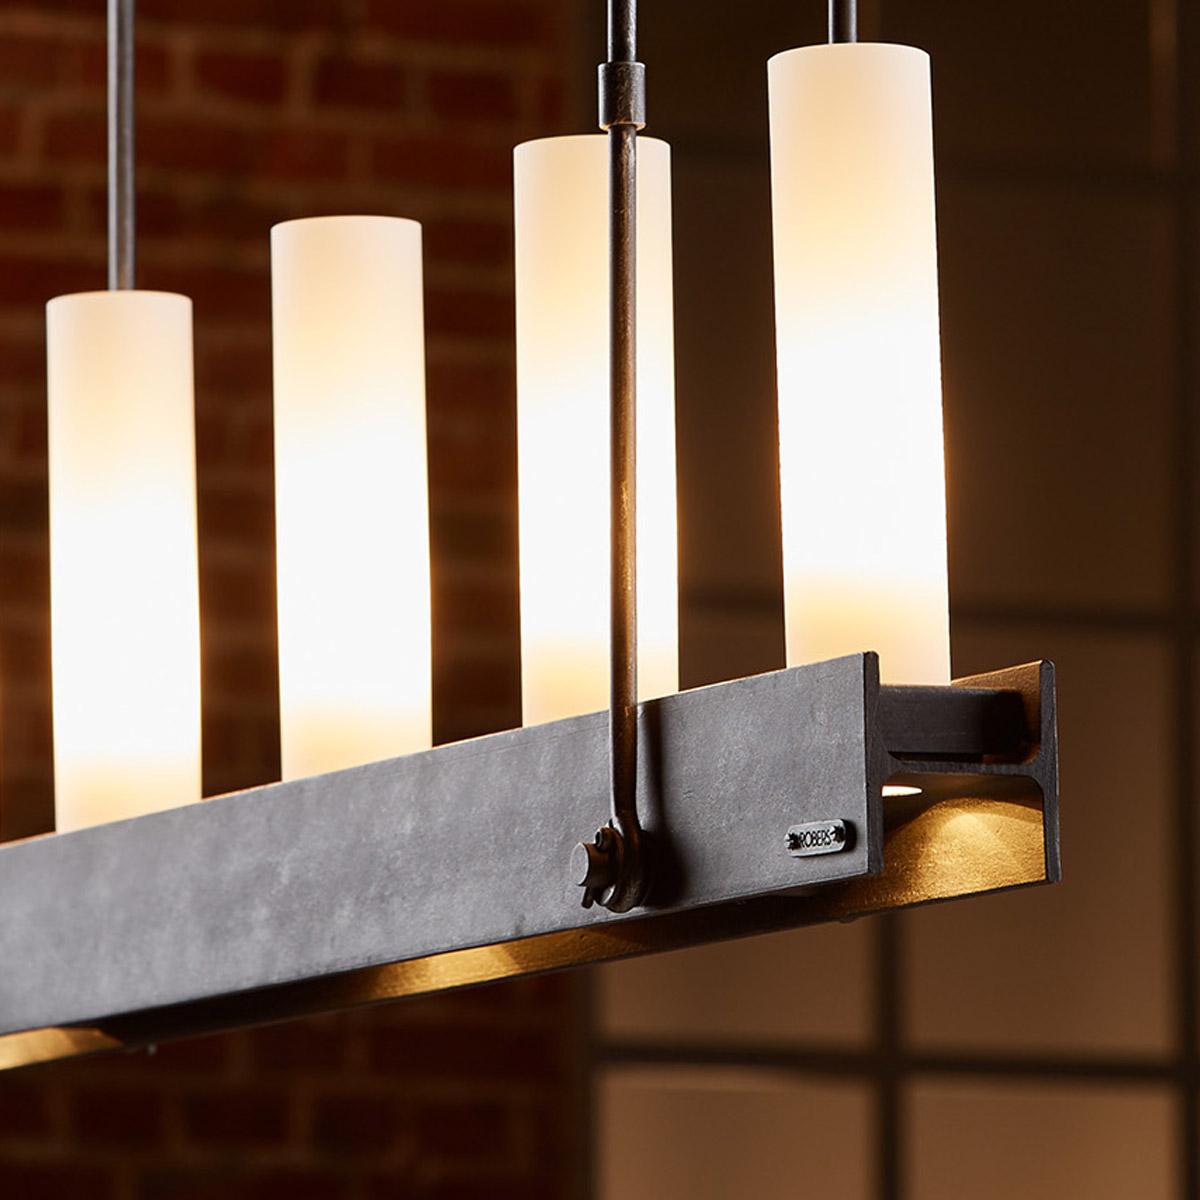 Robers Leuchten iron hanging light with downward spotlights casa lumi